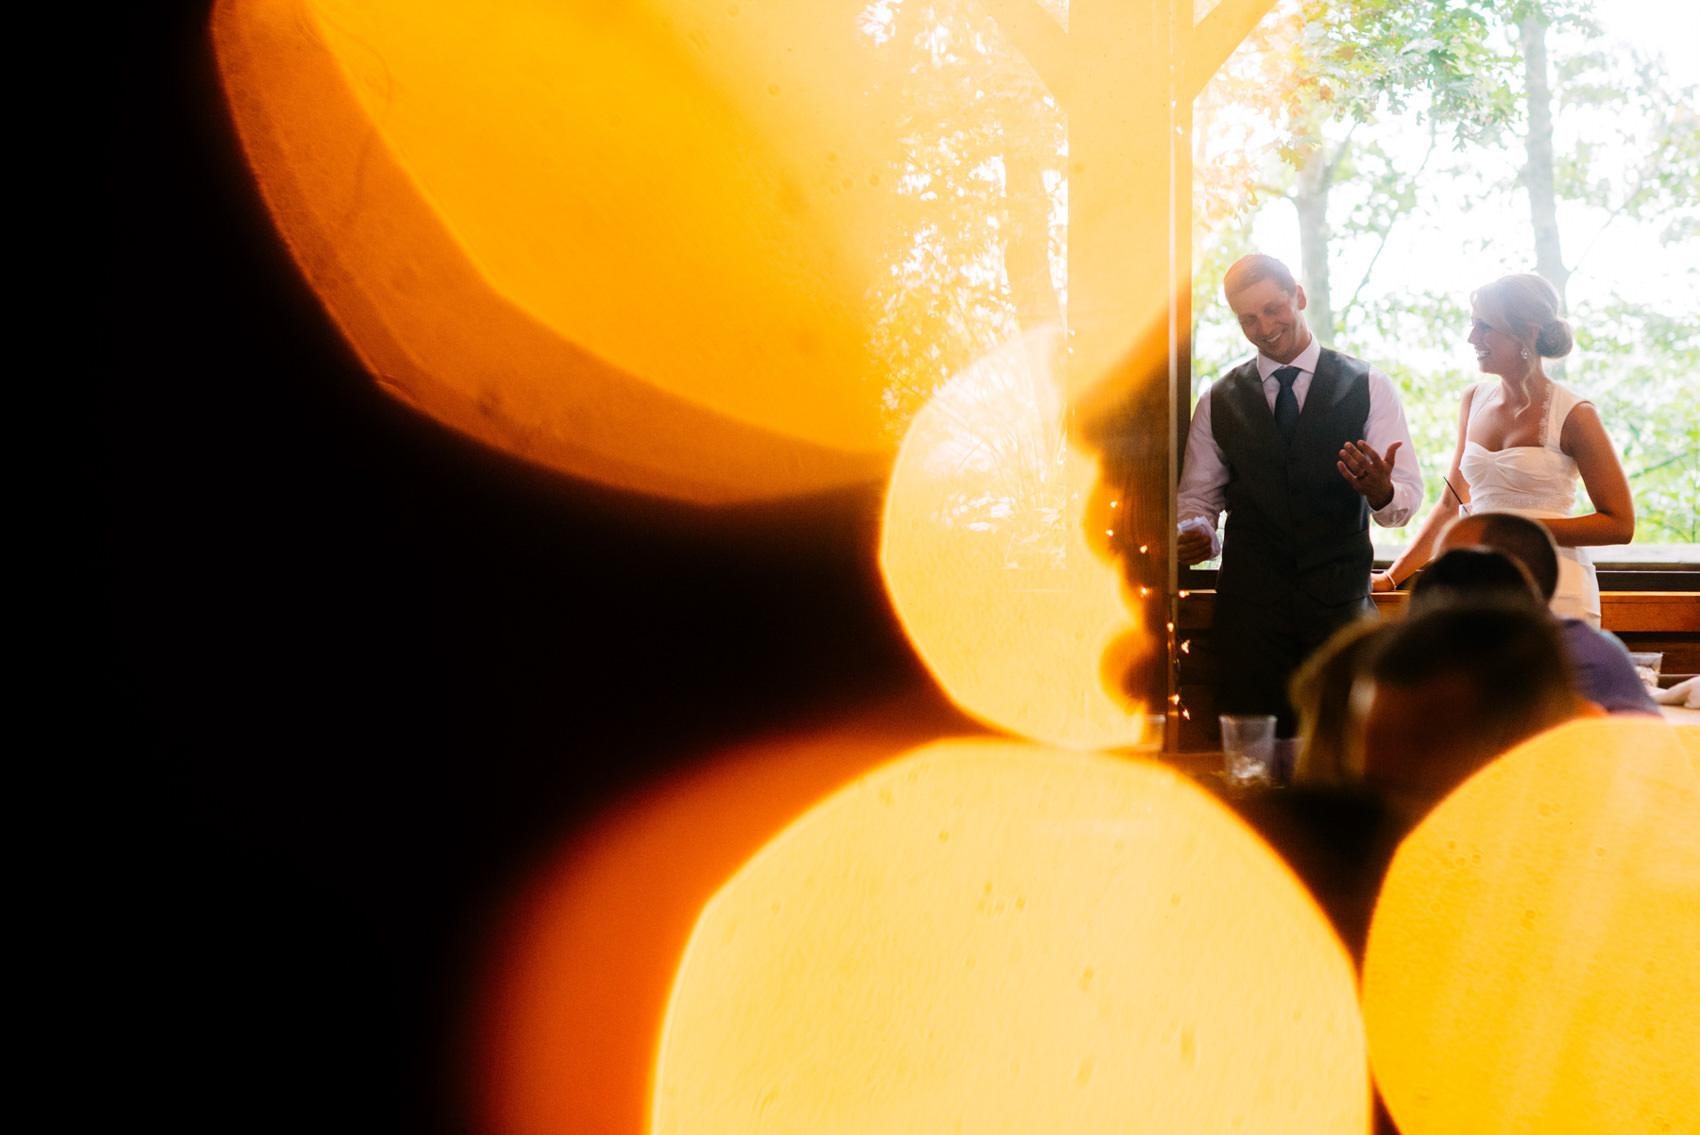 046-oberports-wedding-reception-portfolio